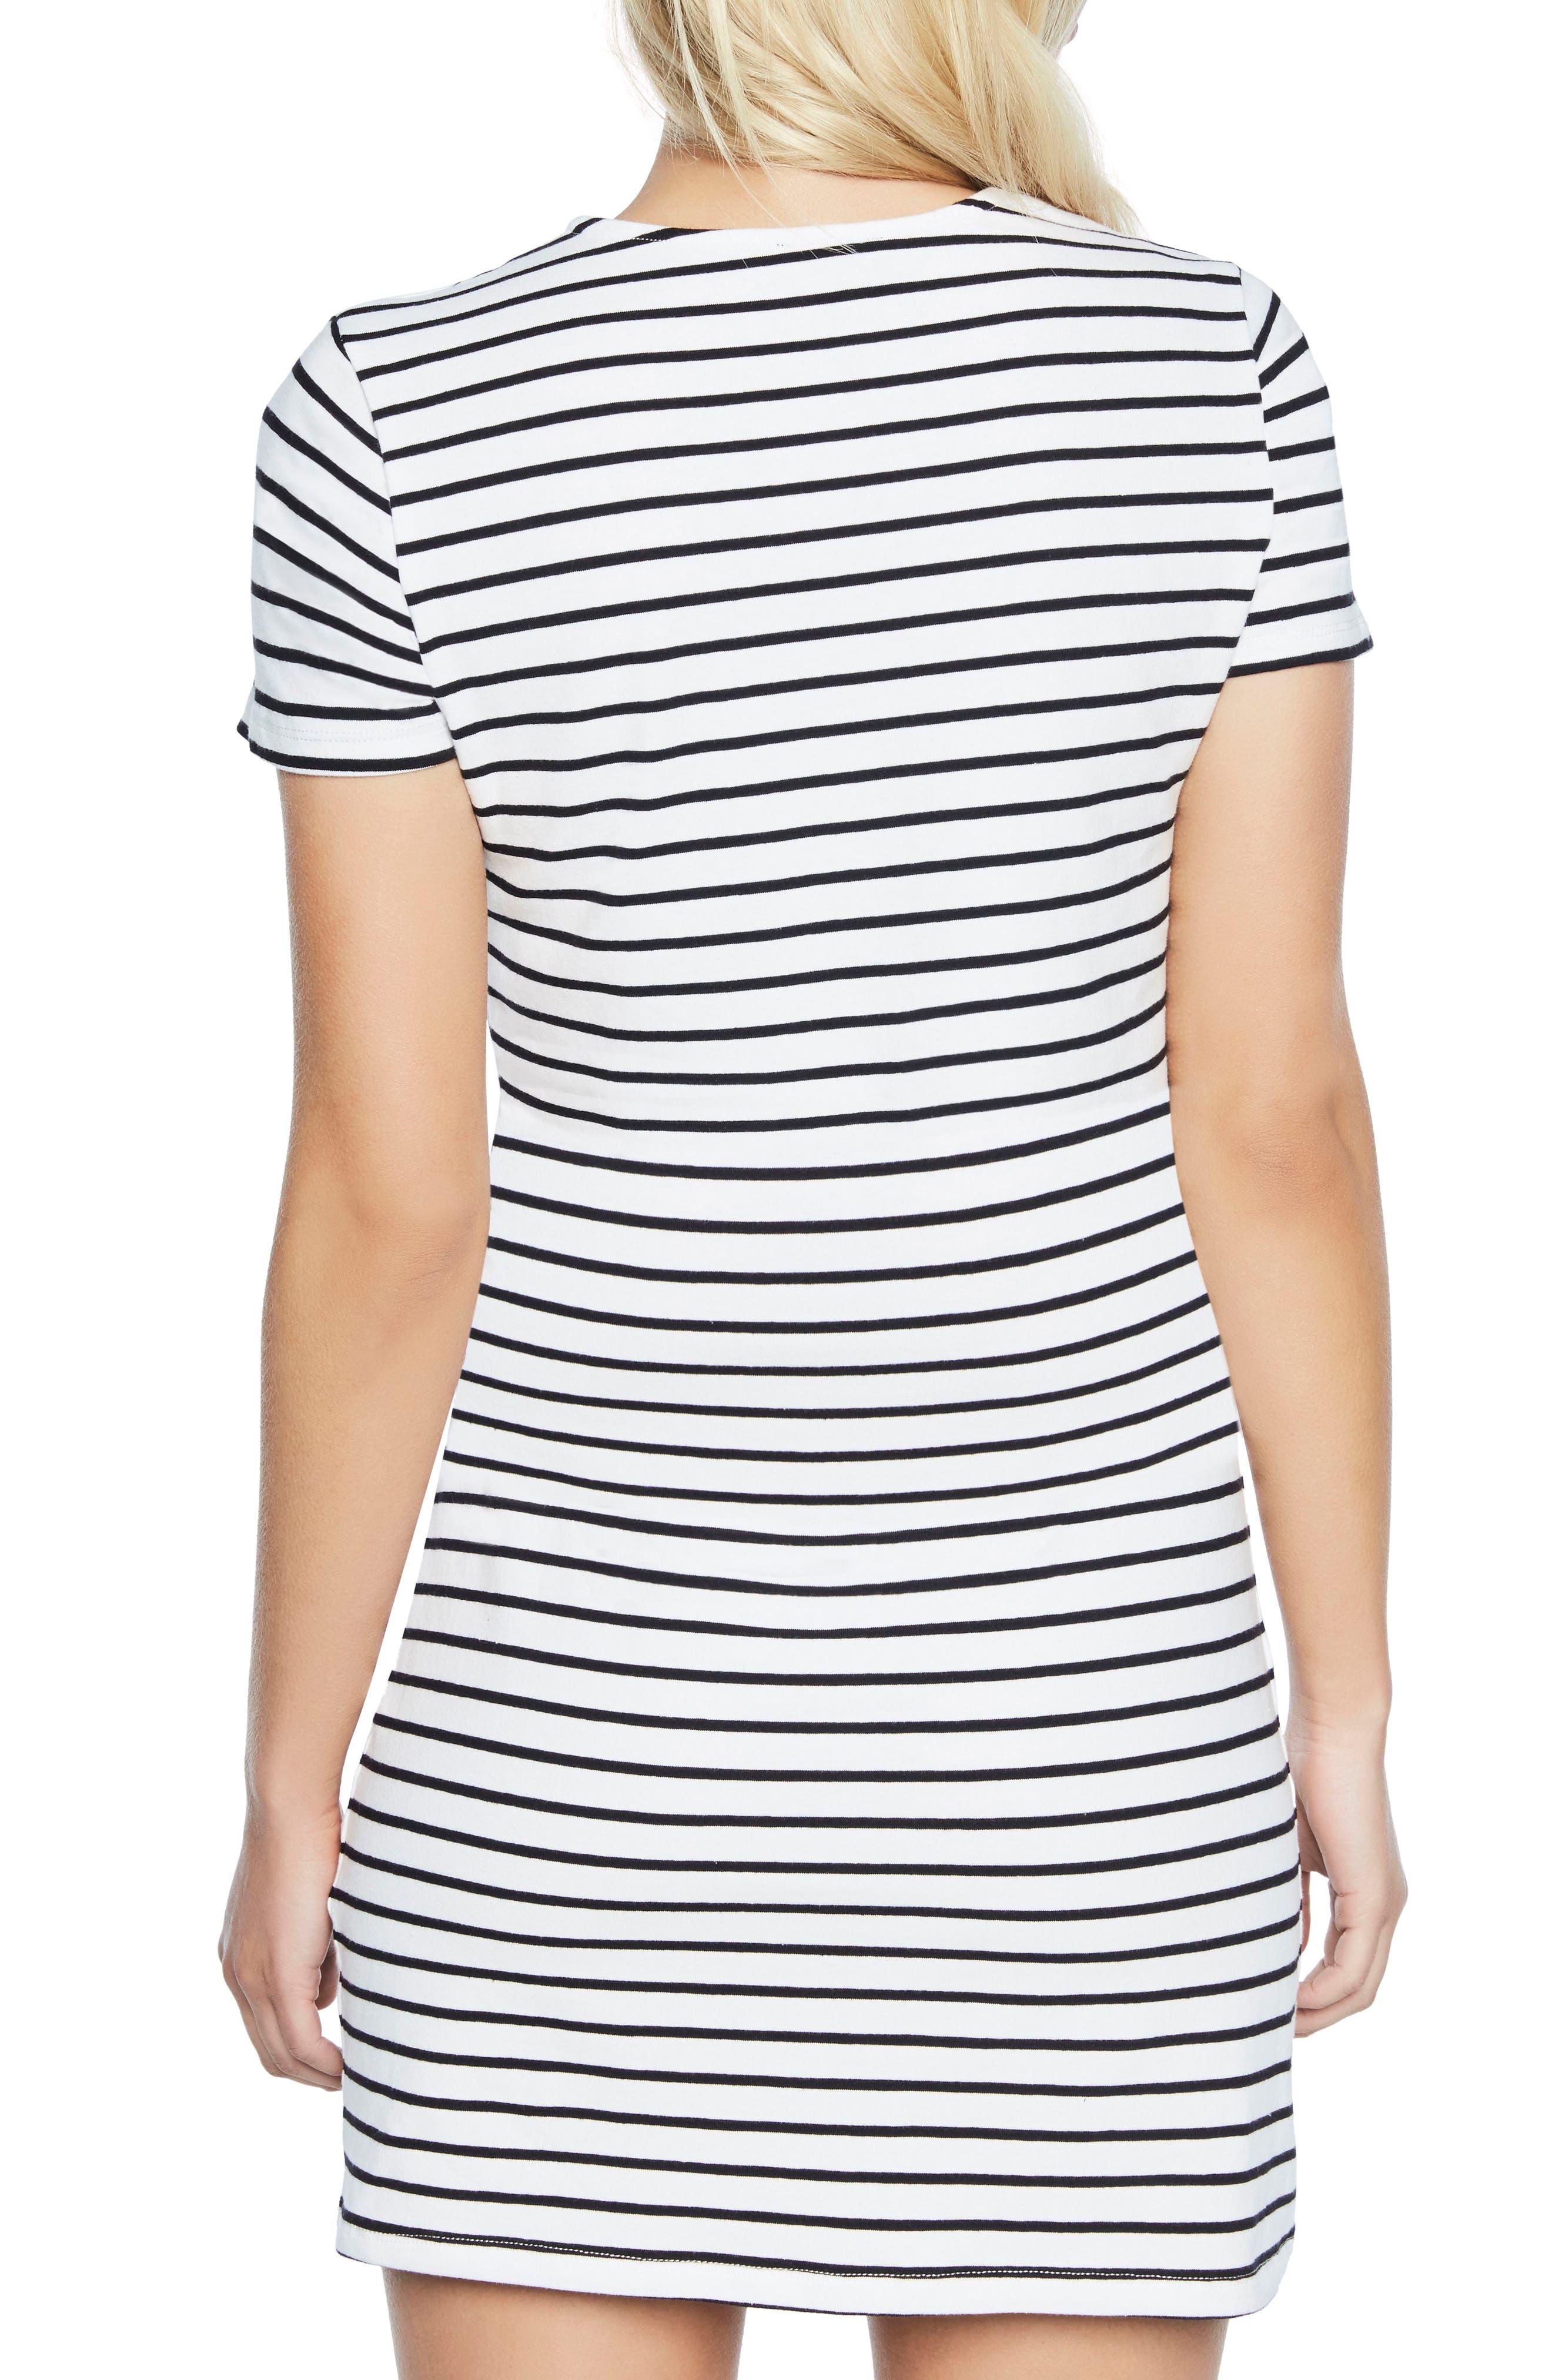 Stripe Shift Dress,                             Alternate thumbnail 2, color,                             002